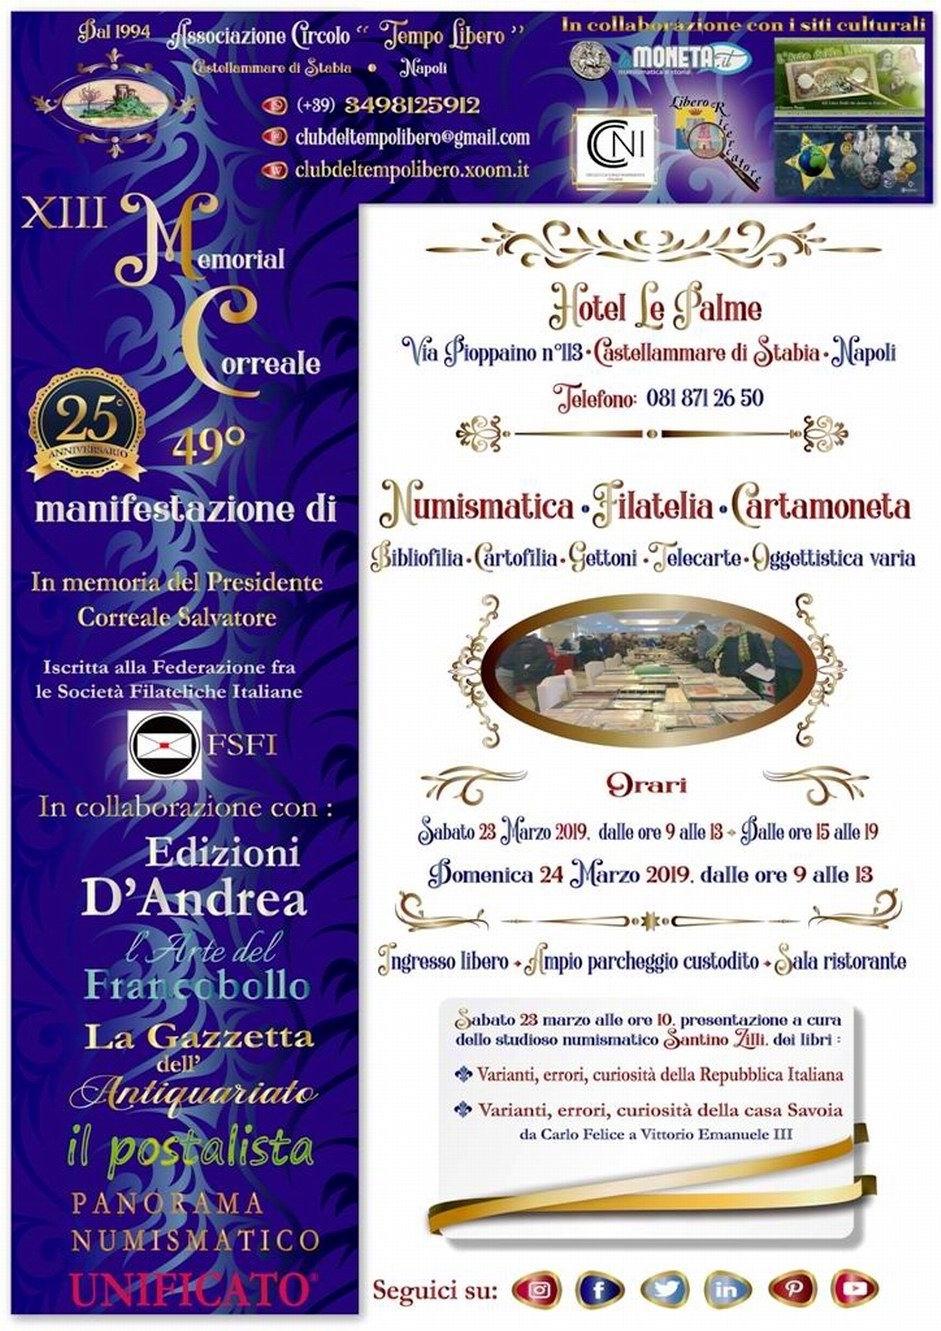 Locandina XIII Memorial Correale